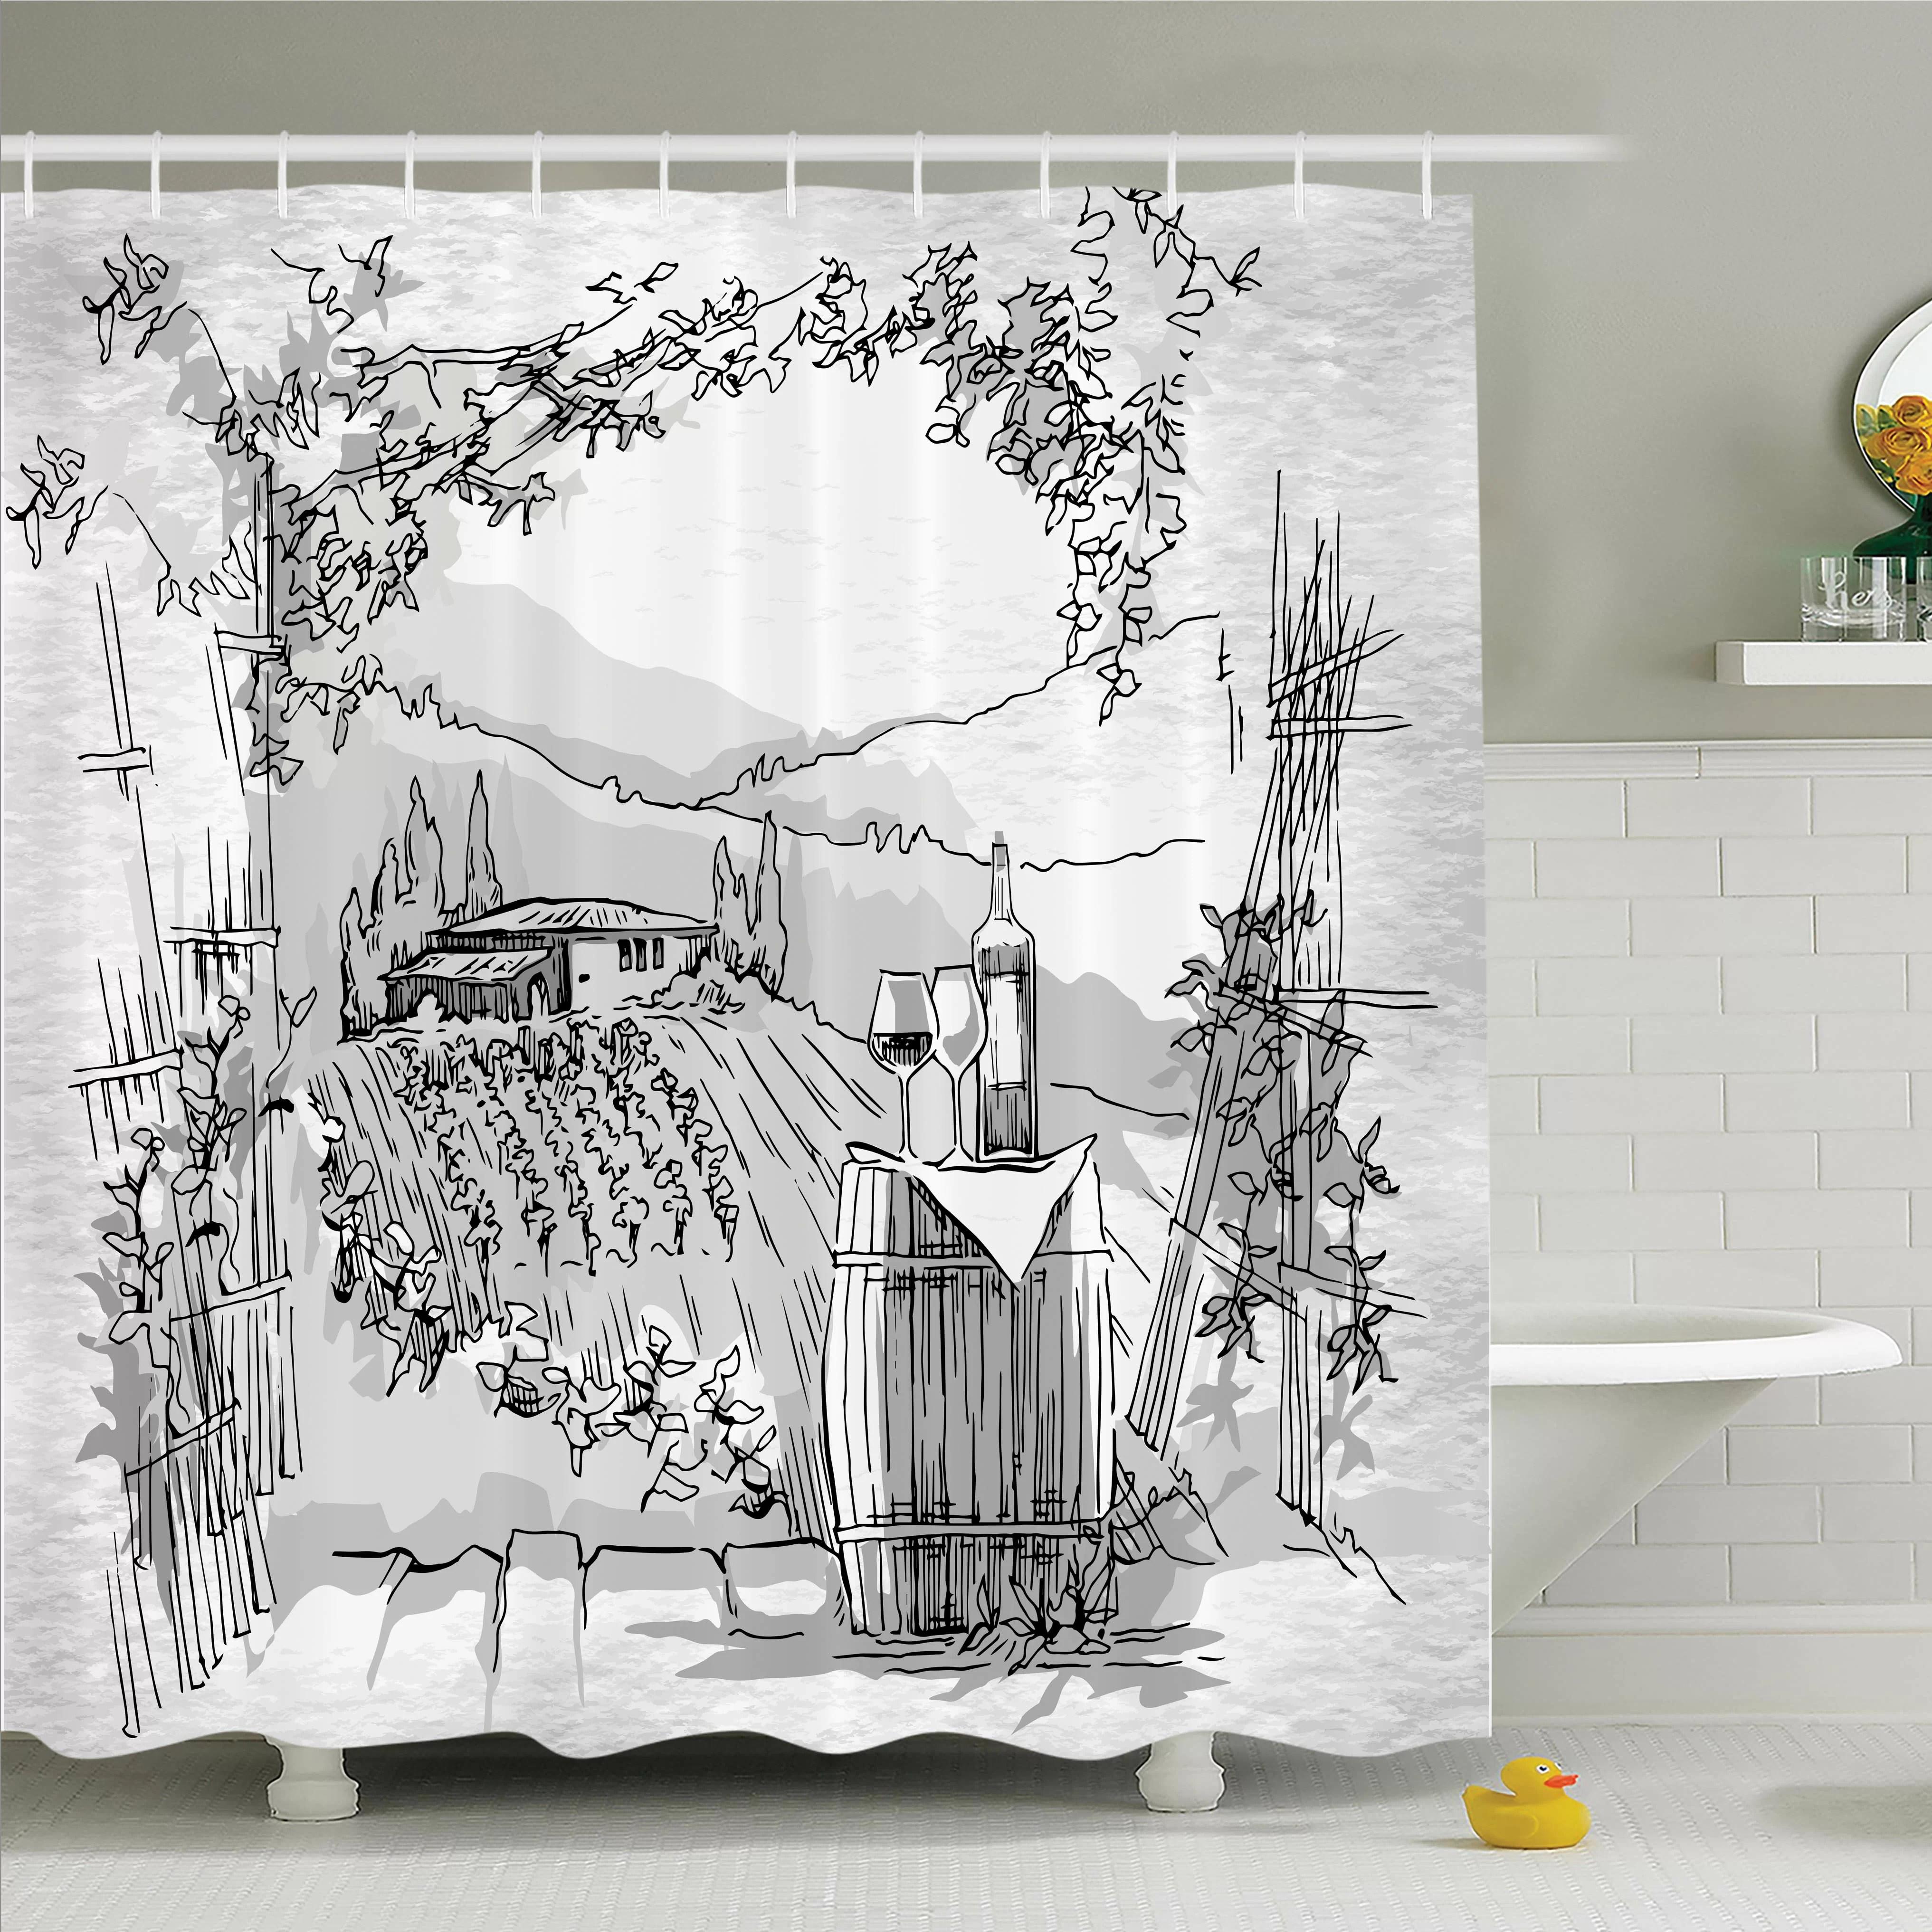 geometic helix swirls shower curtain with hooks bathroom rug set 15 piece set home garden patterer bathroom supplies accessories